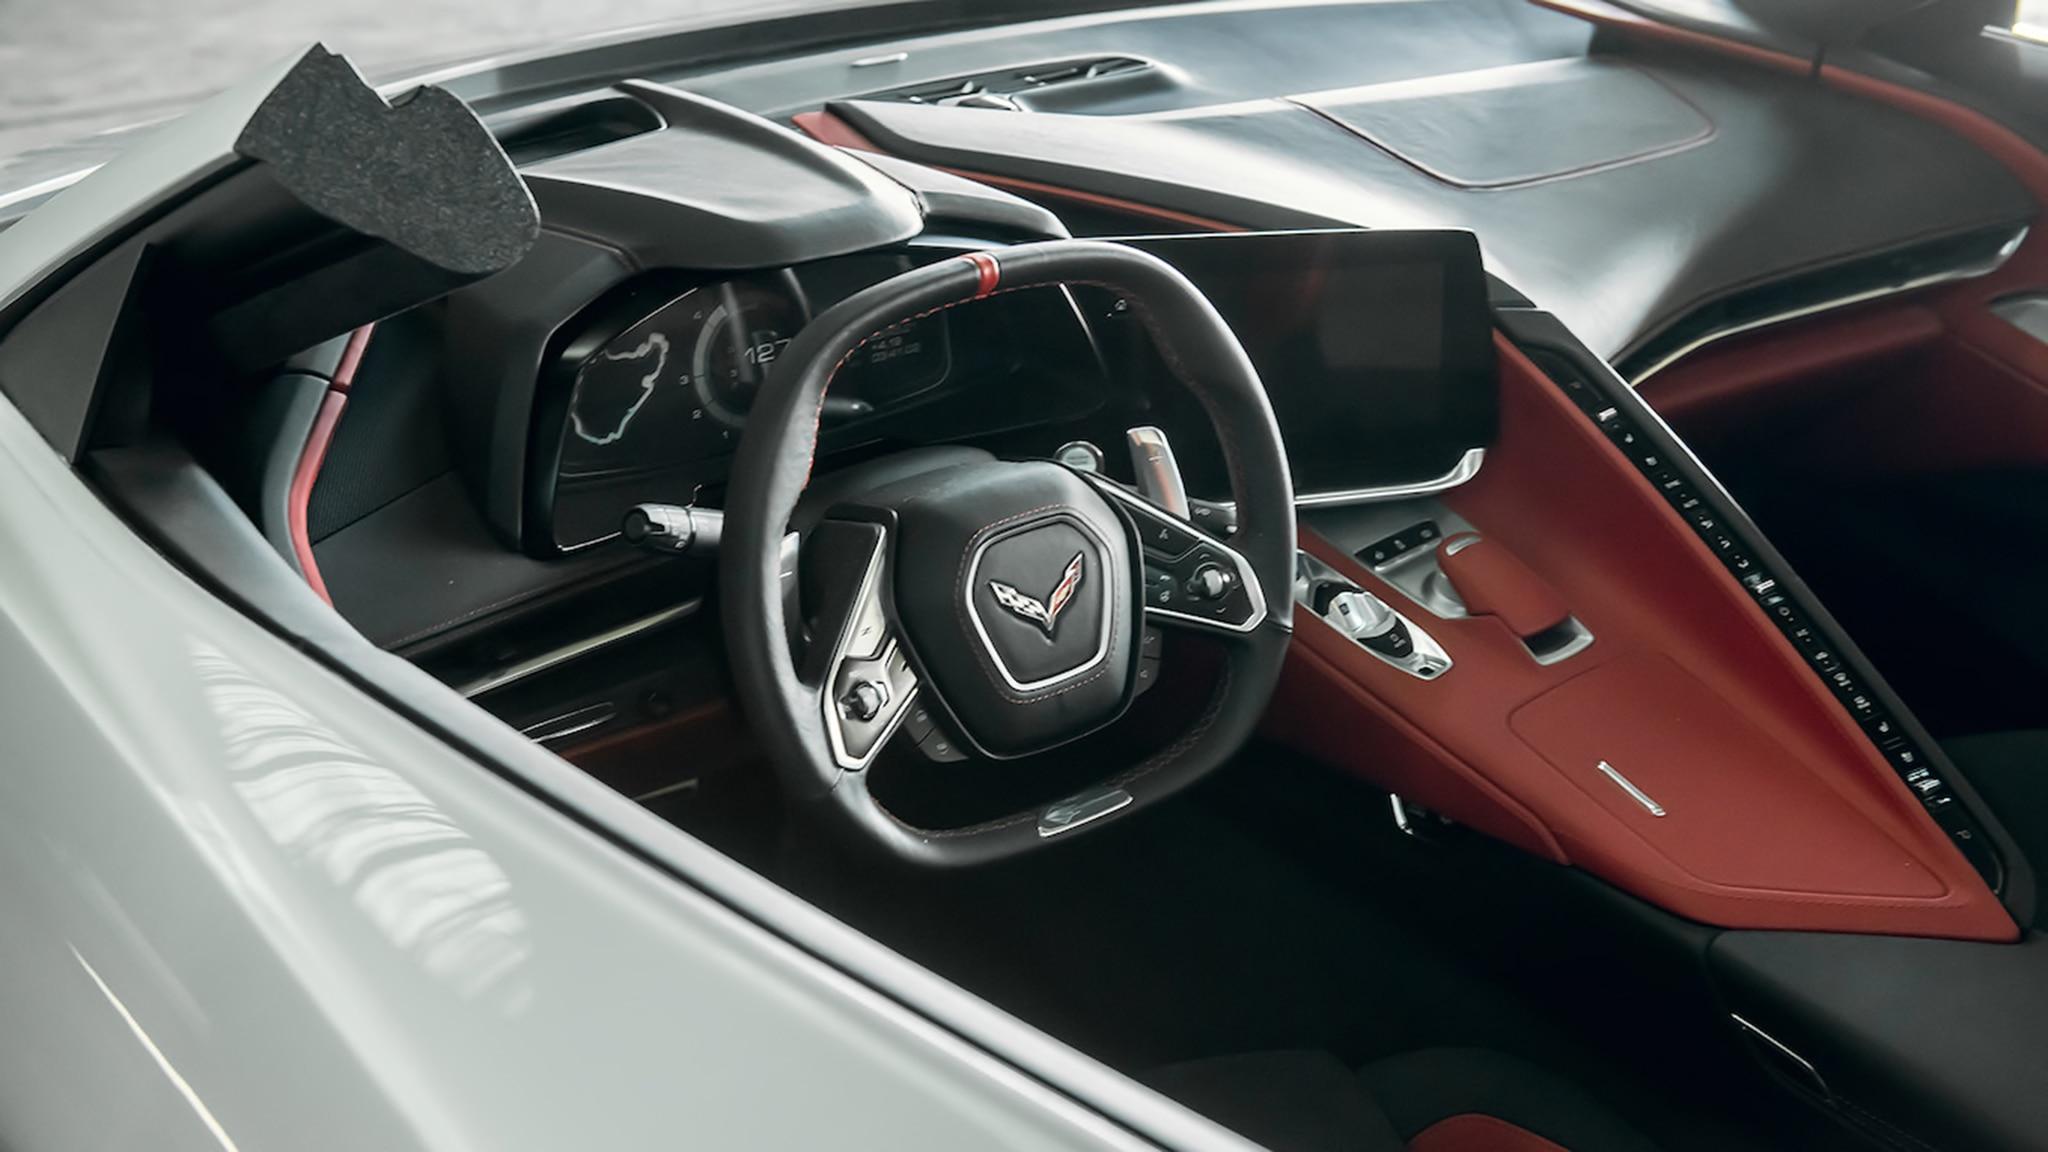 The 10 Best Chevrolet Engines - Automobile Magazine